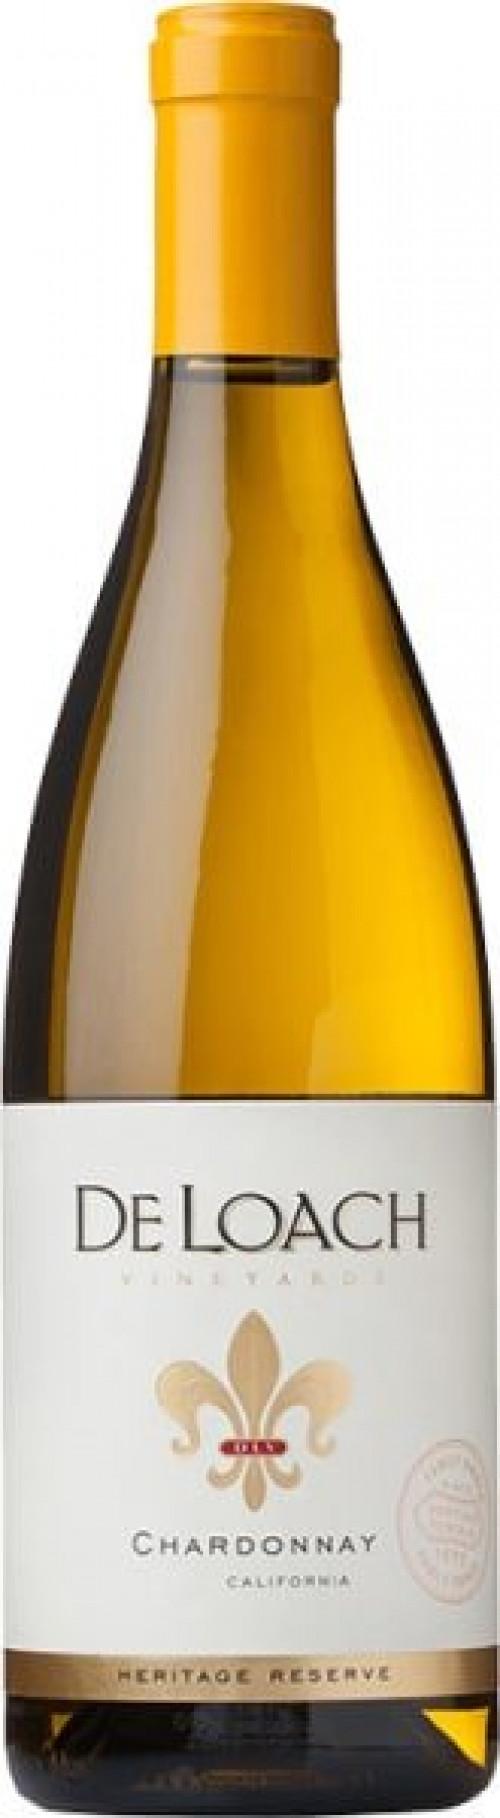 2017 DeLoach Heritage Chardonnay 750ml